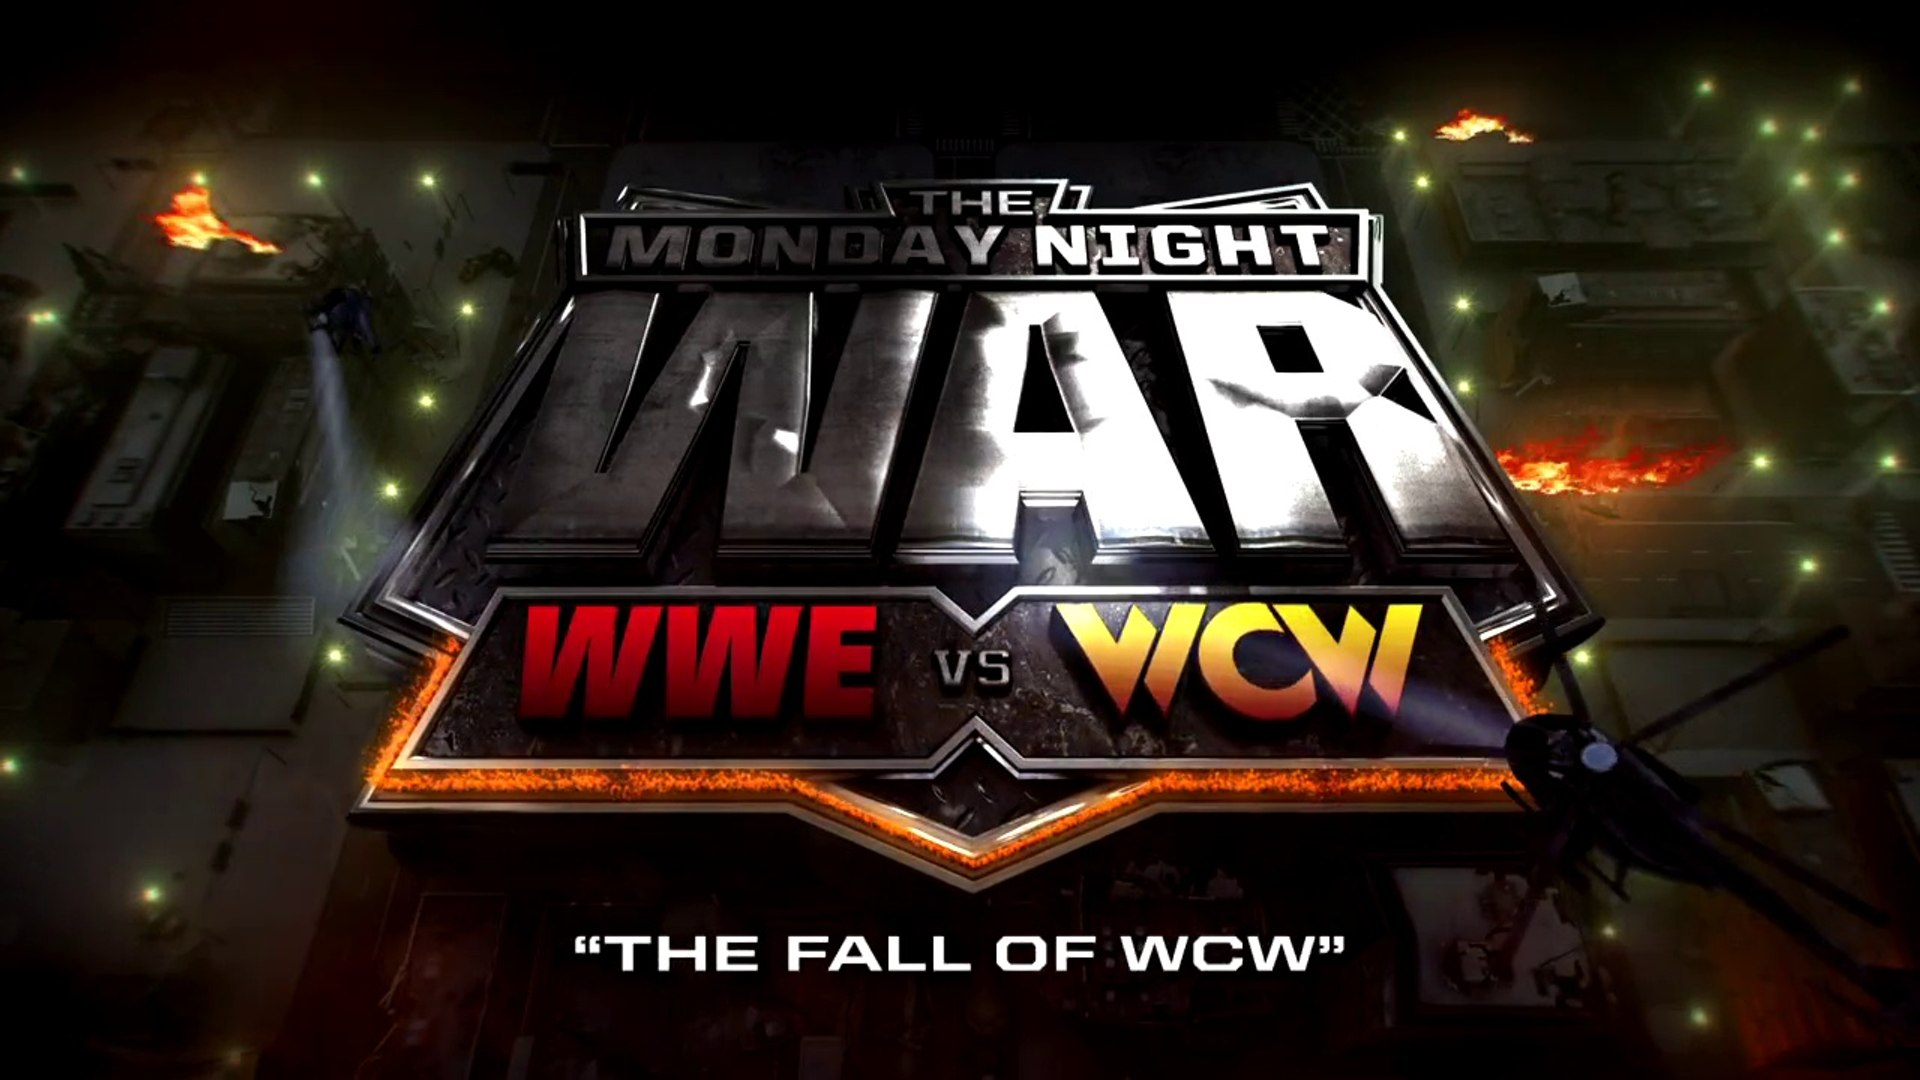 Monday Night War - The Fall Of WCW